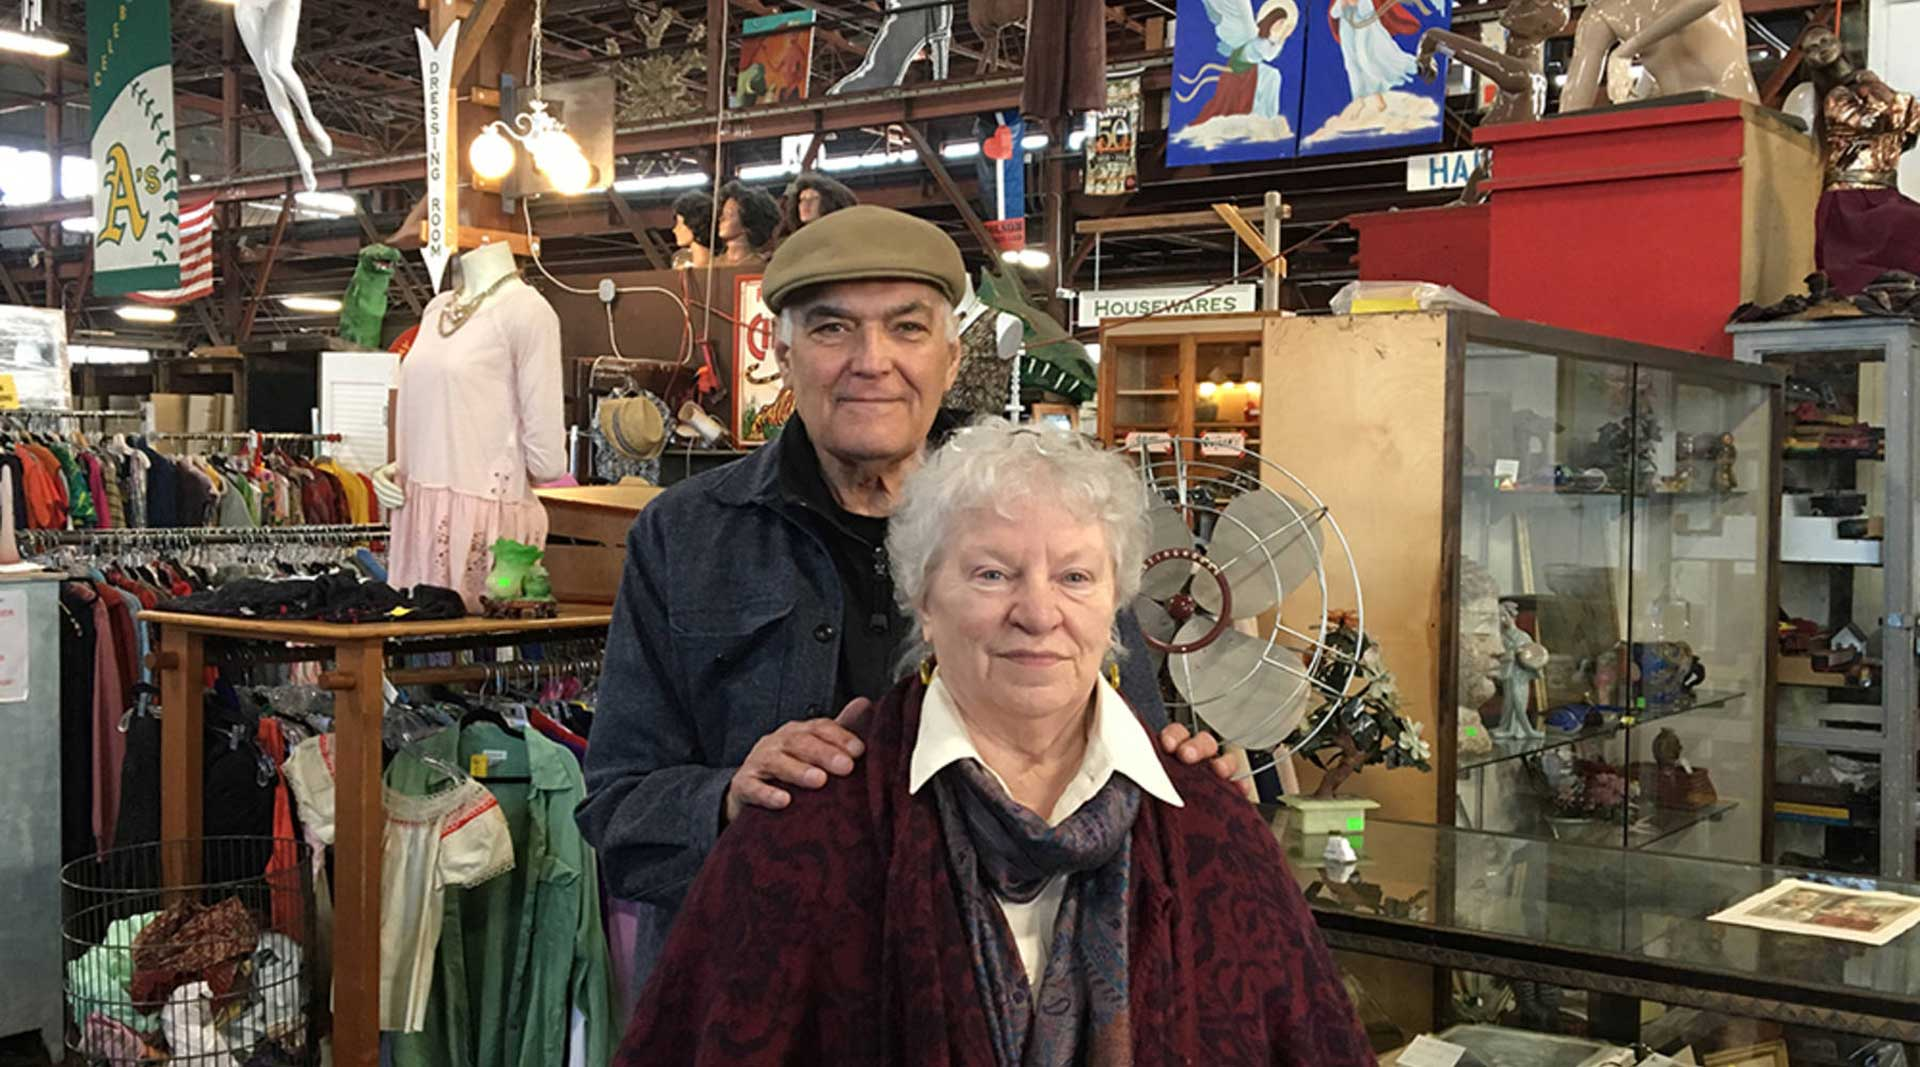 Dan and Mary Lou, Retiring Owners of Urban Ore in California